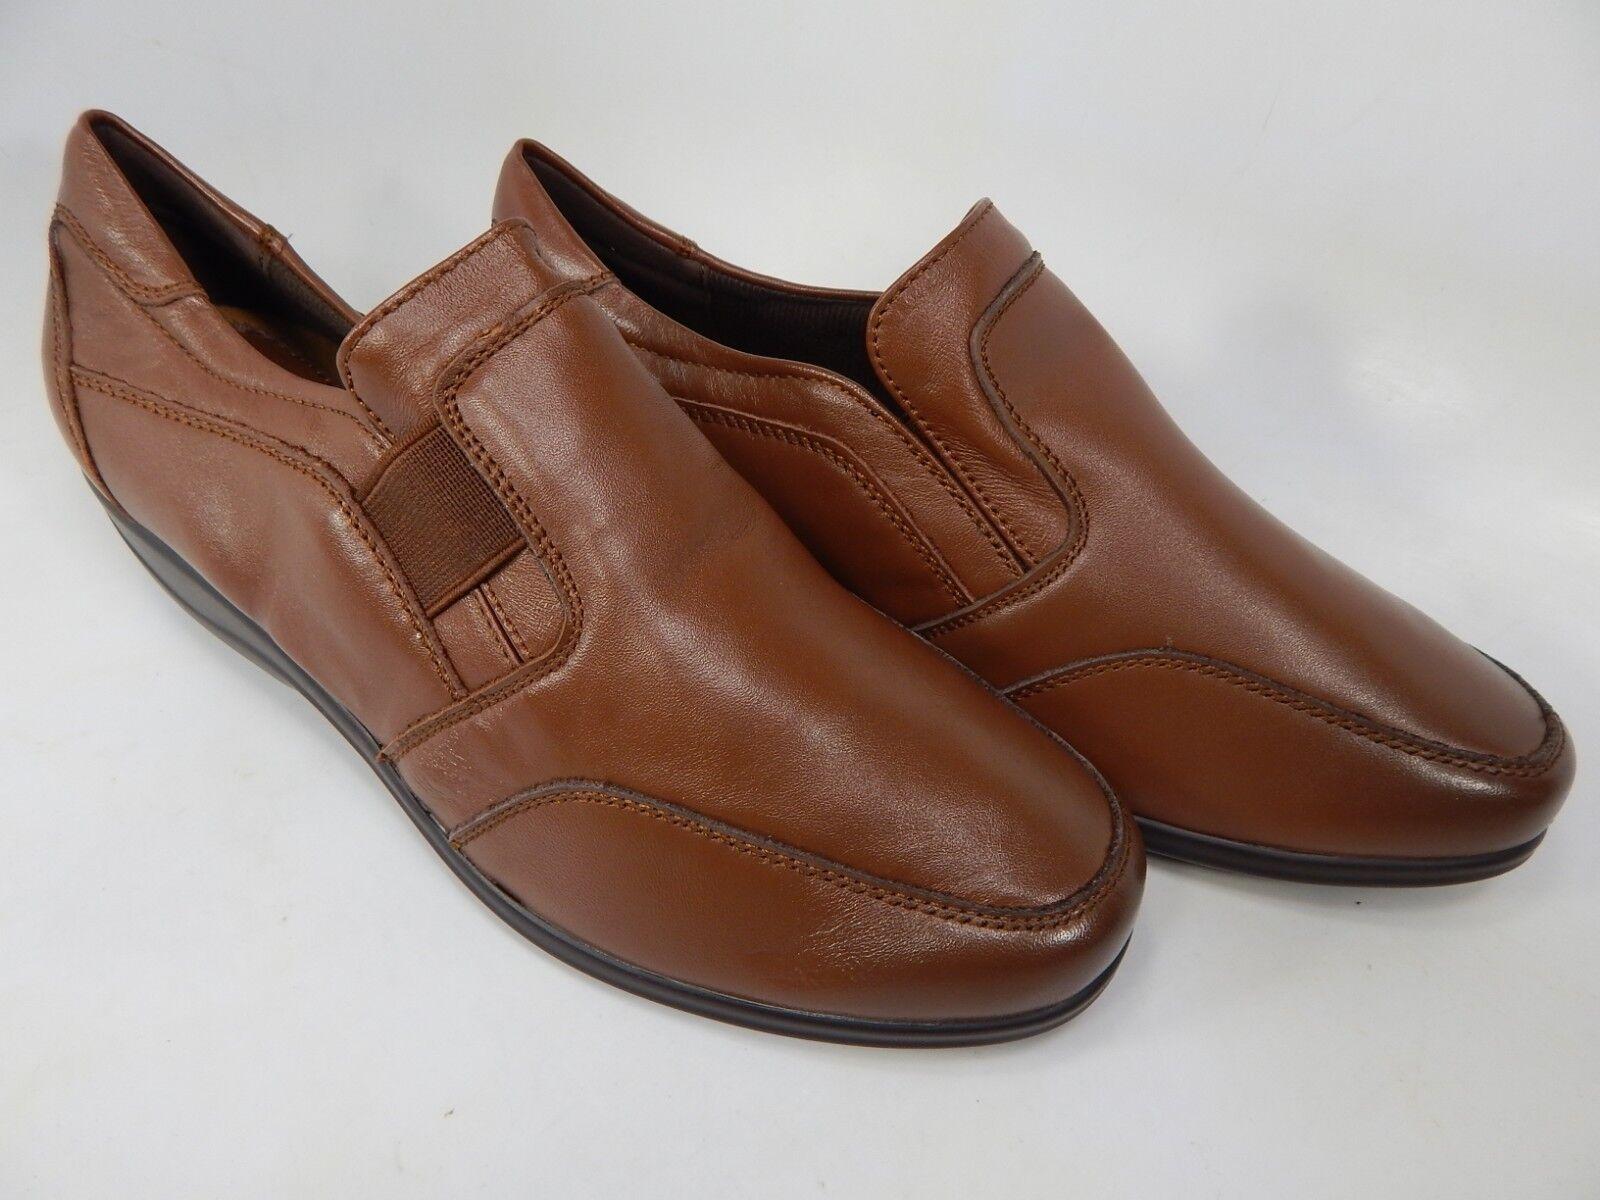 Propet Melinda Size 7 M (B) Women's Leather Loafers shoes Brown WCX024L